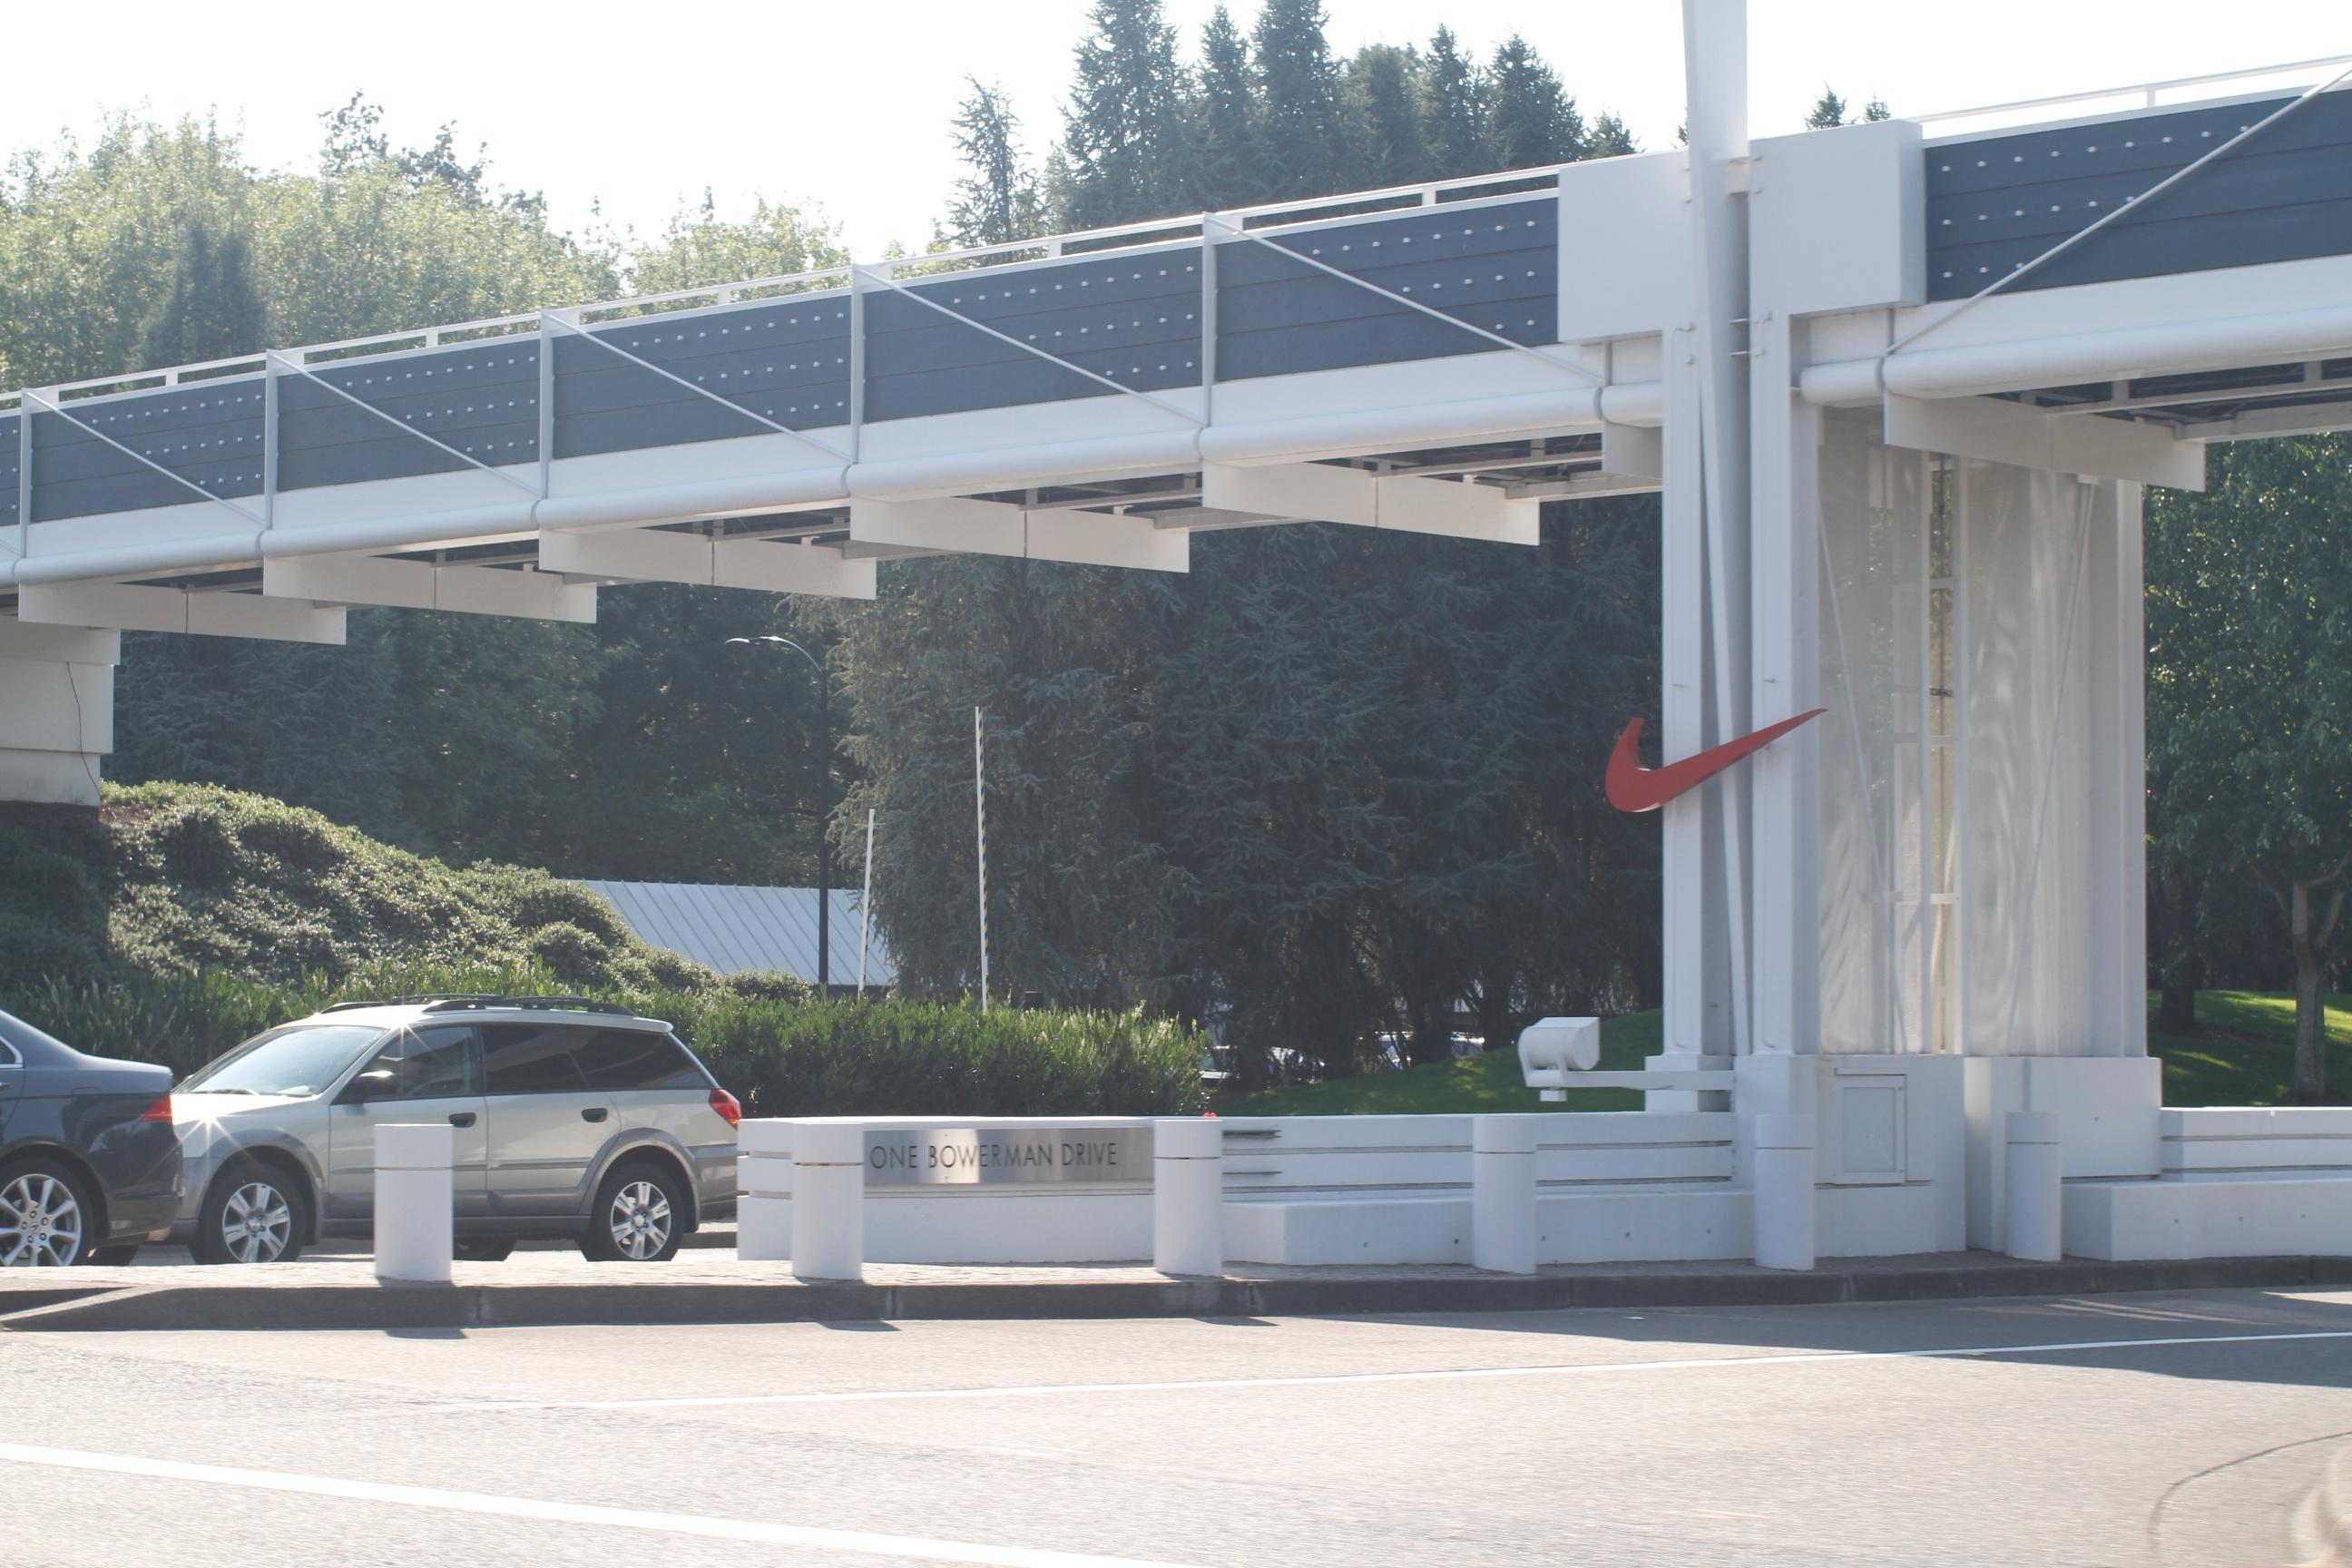 File:Nike headquarters entrance.jpg